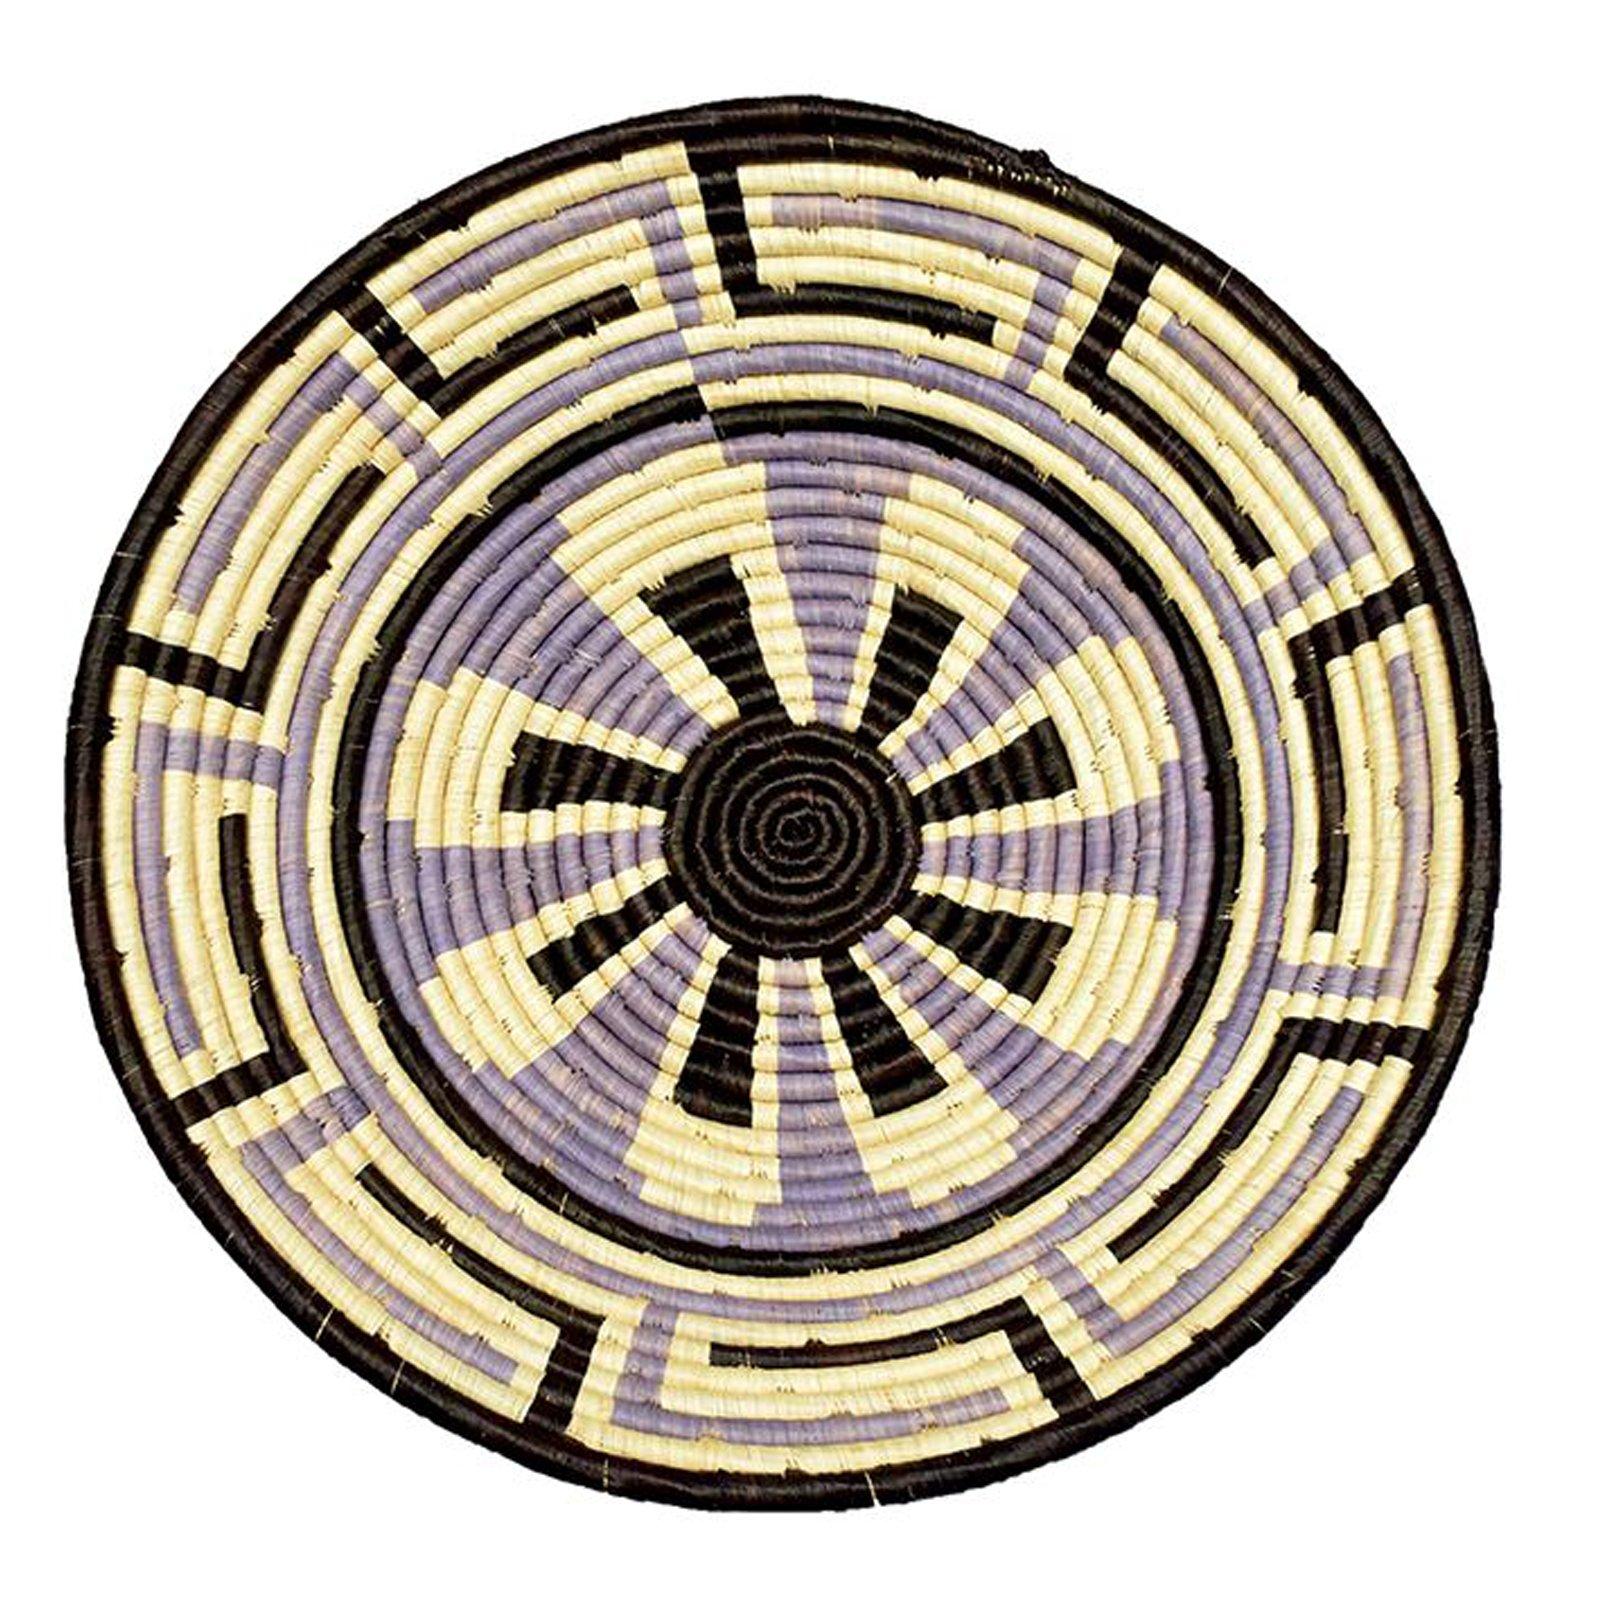 The Crabby Nook Stardust Design Fruit or Display African Basket Handwoven Home Decor